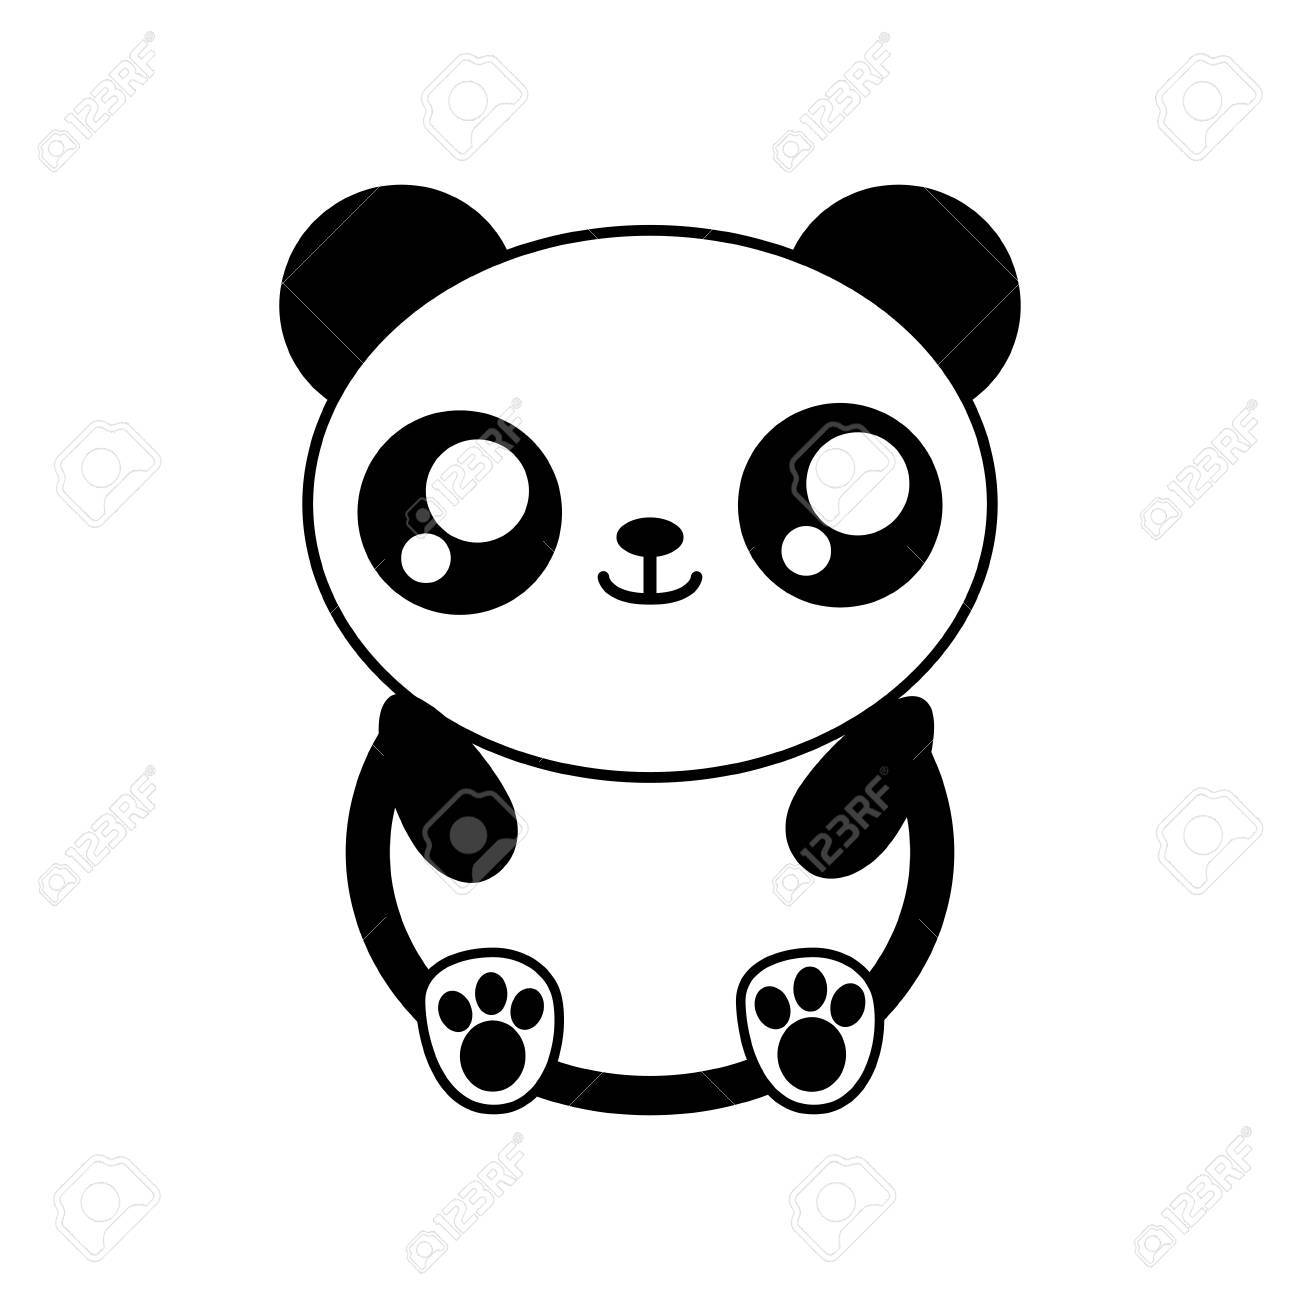 Kawaii Cute Panda Pictures